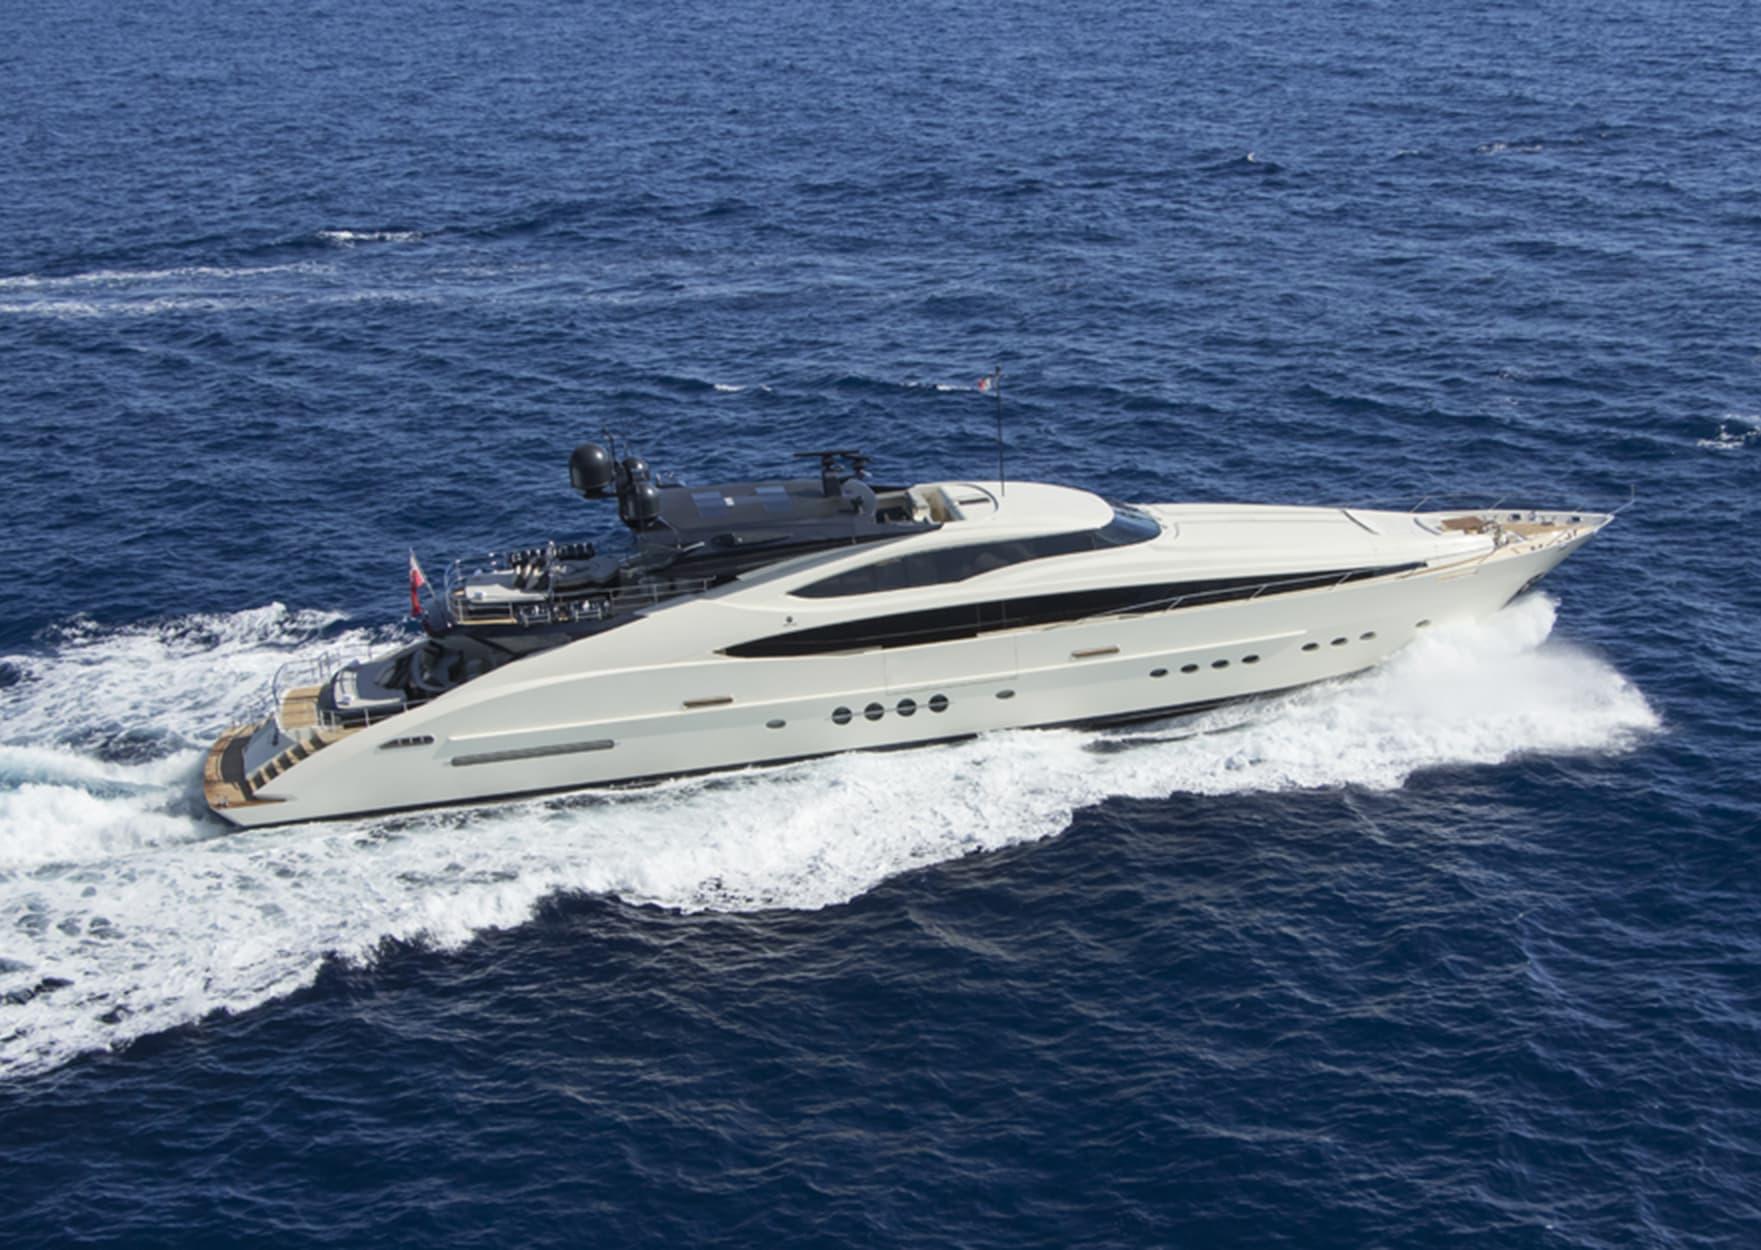 Image of Vantage 45.7M (149.9FT) motor yacht